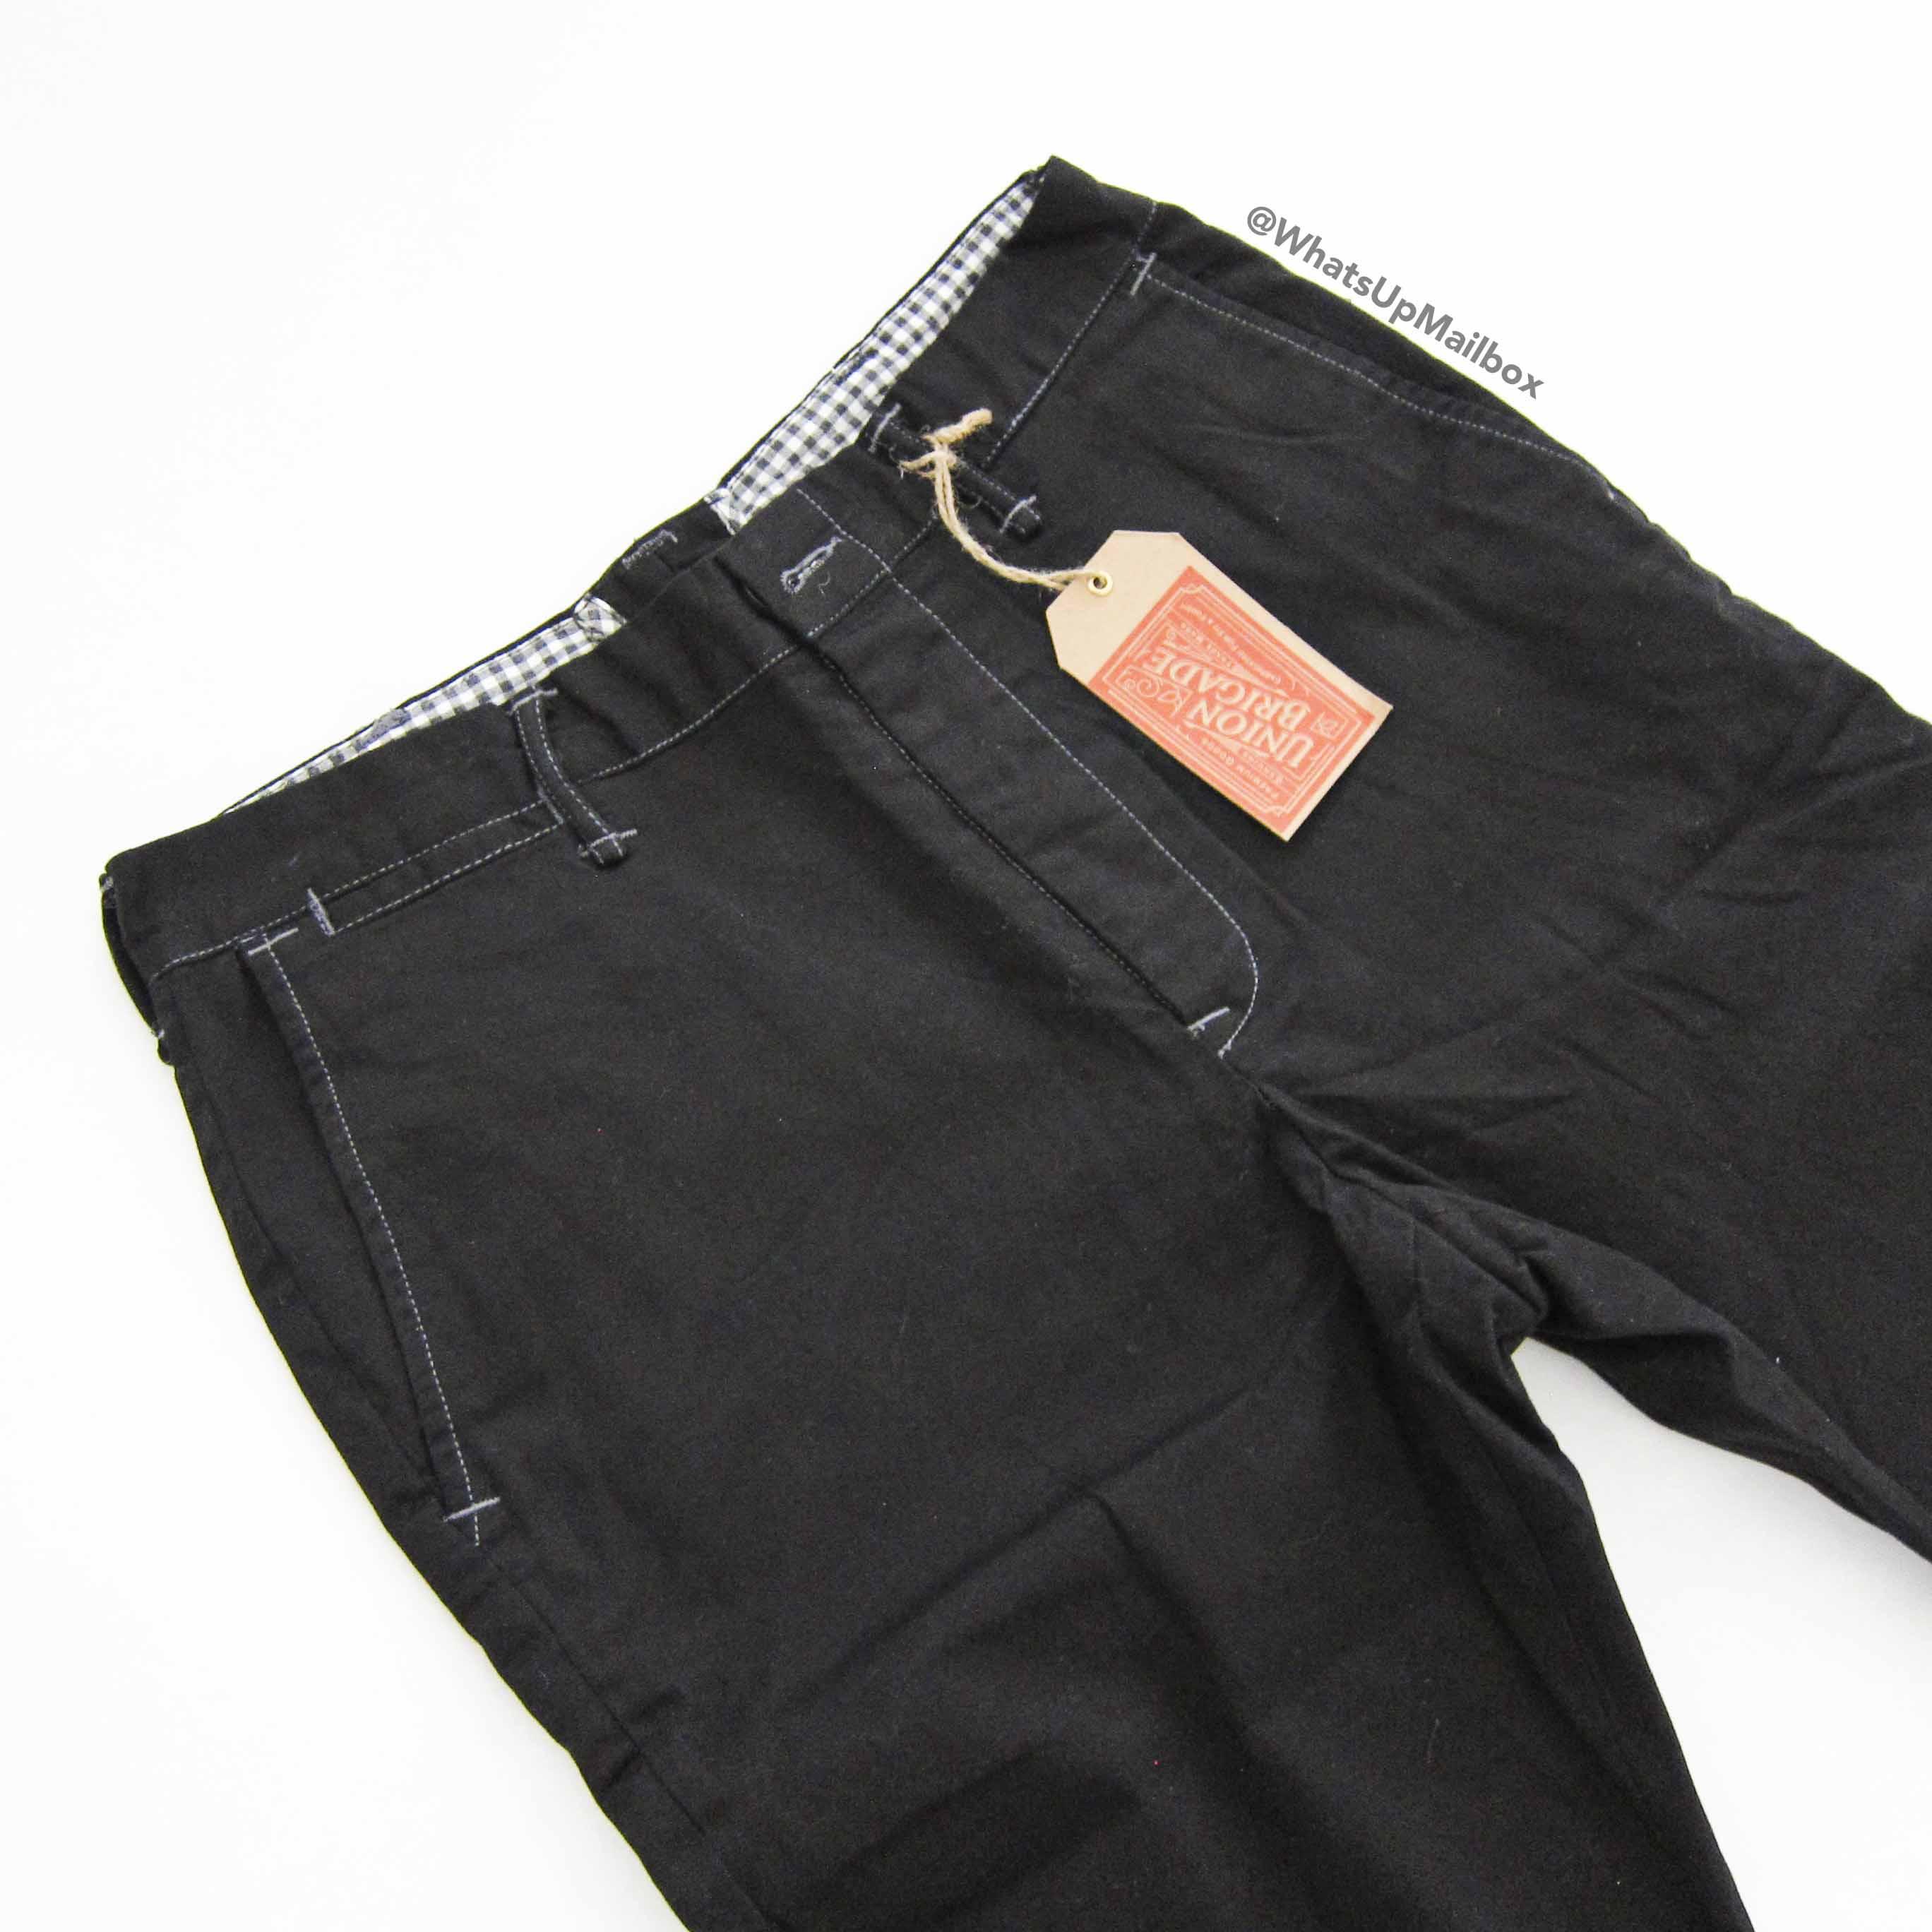 Trendy Butler - Union Brigade Black Jeans